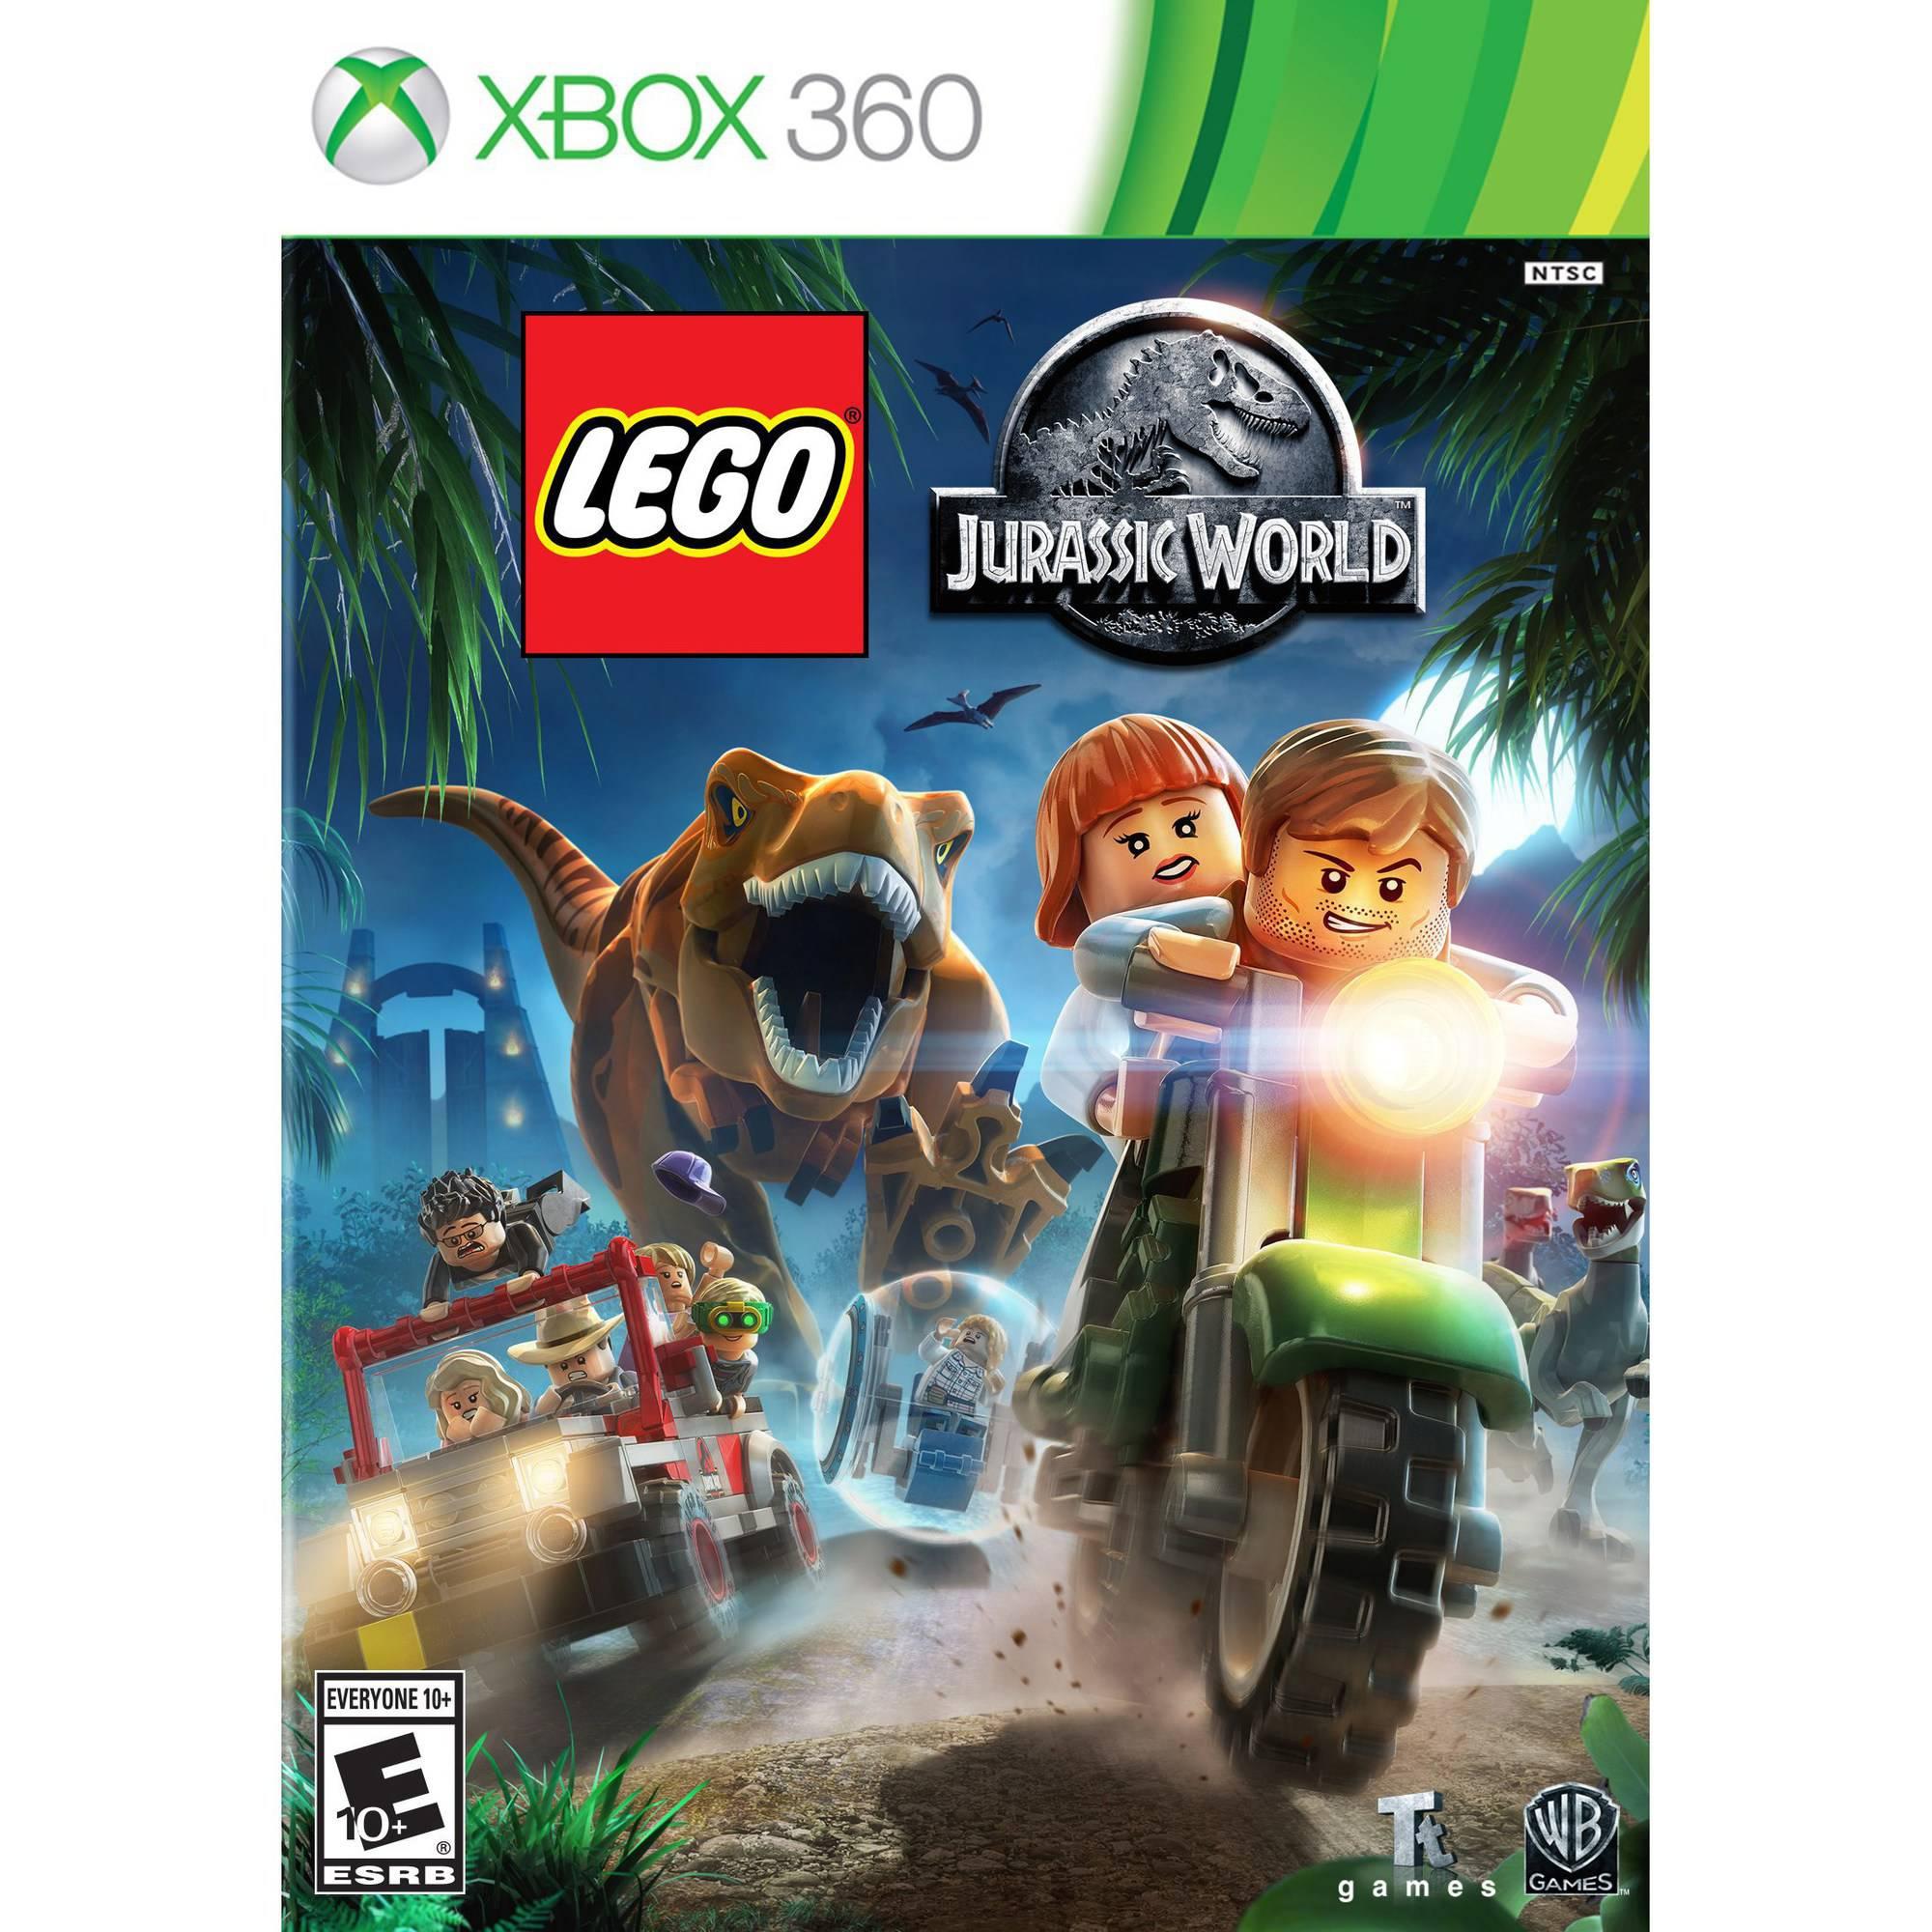 LEGO Jurassic World, Warner, Xbox 360, 883929472710